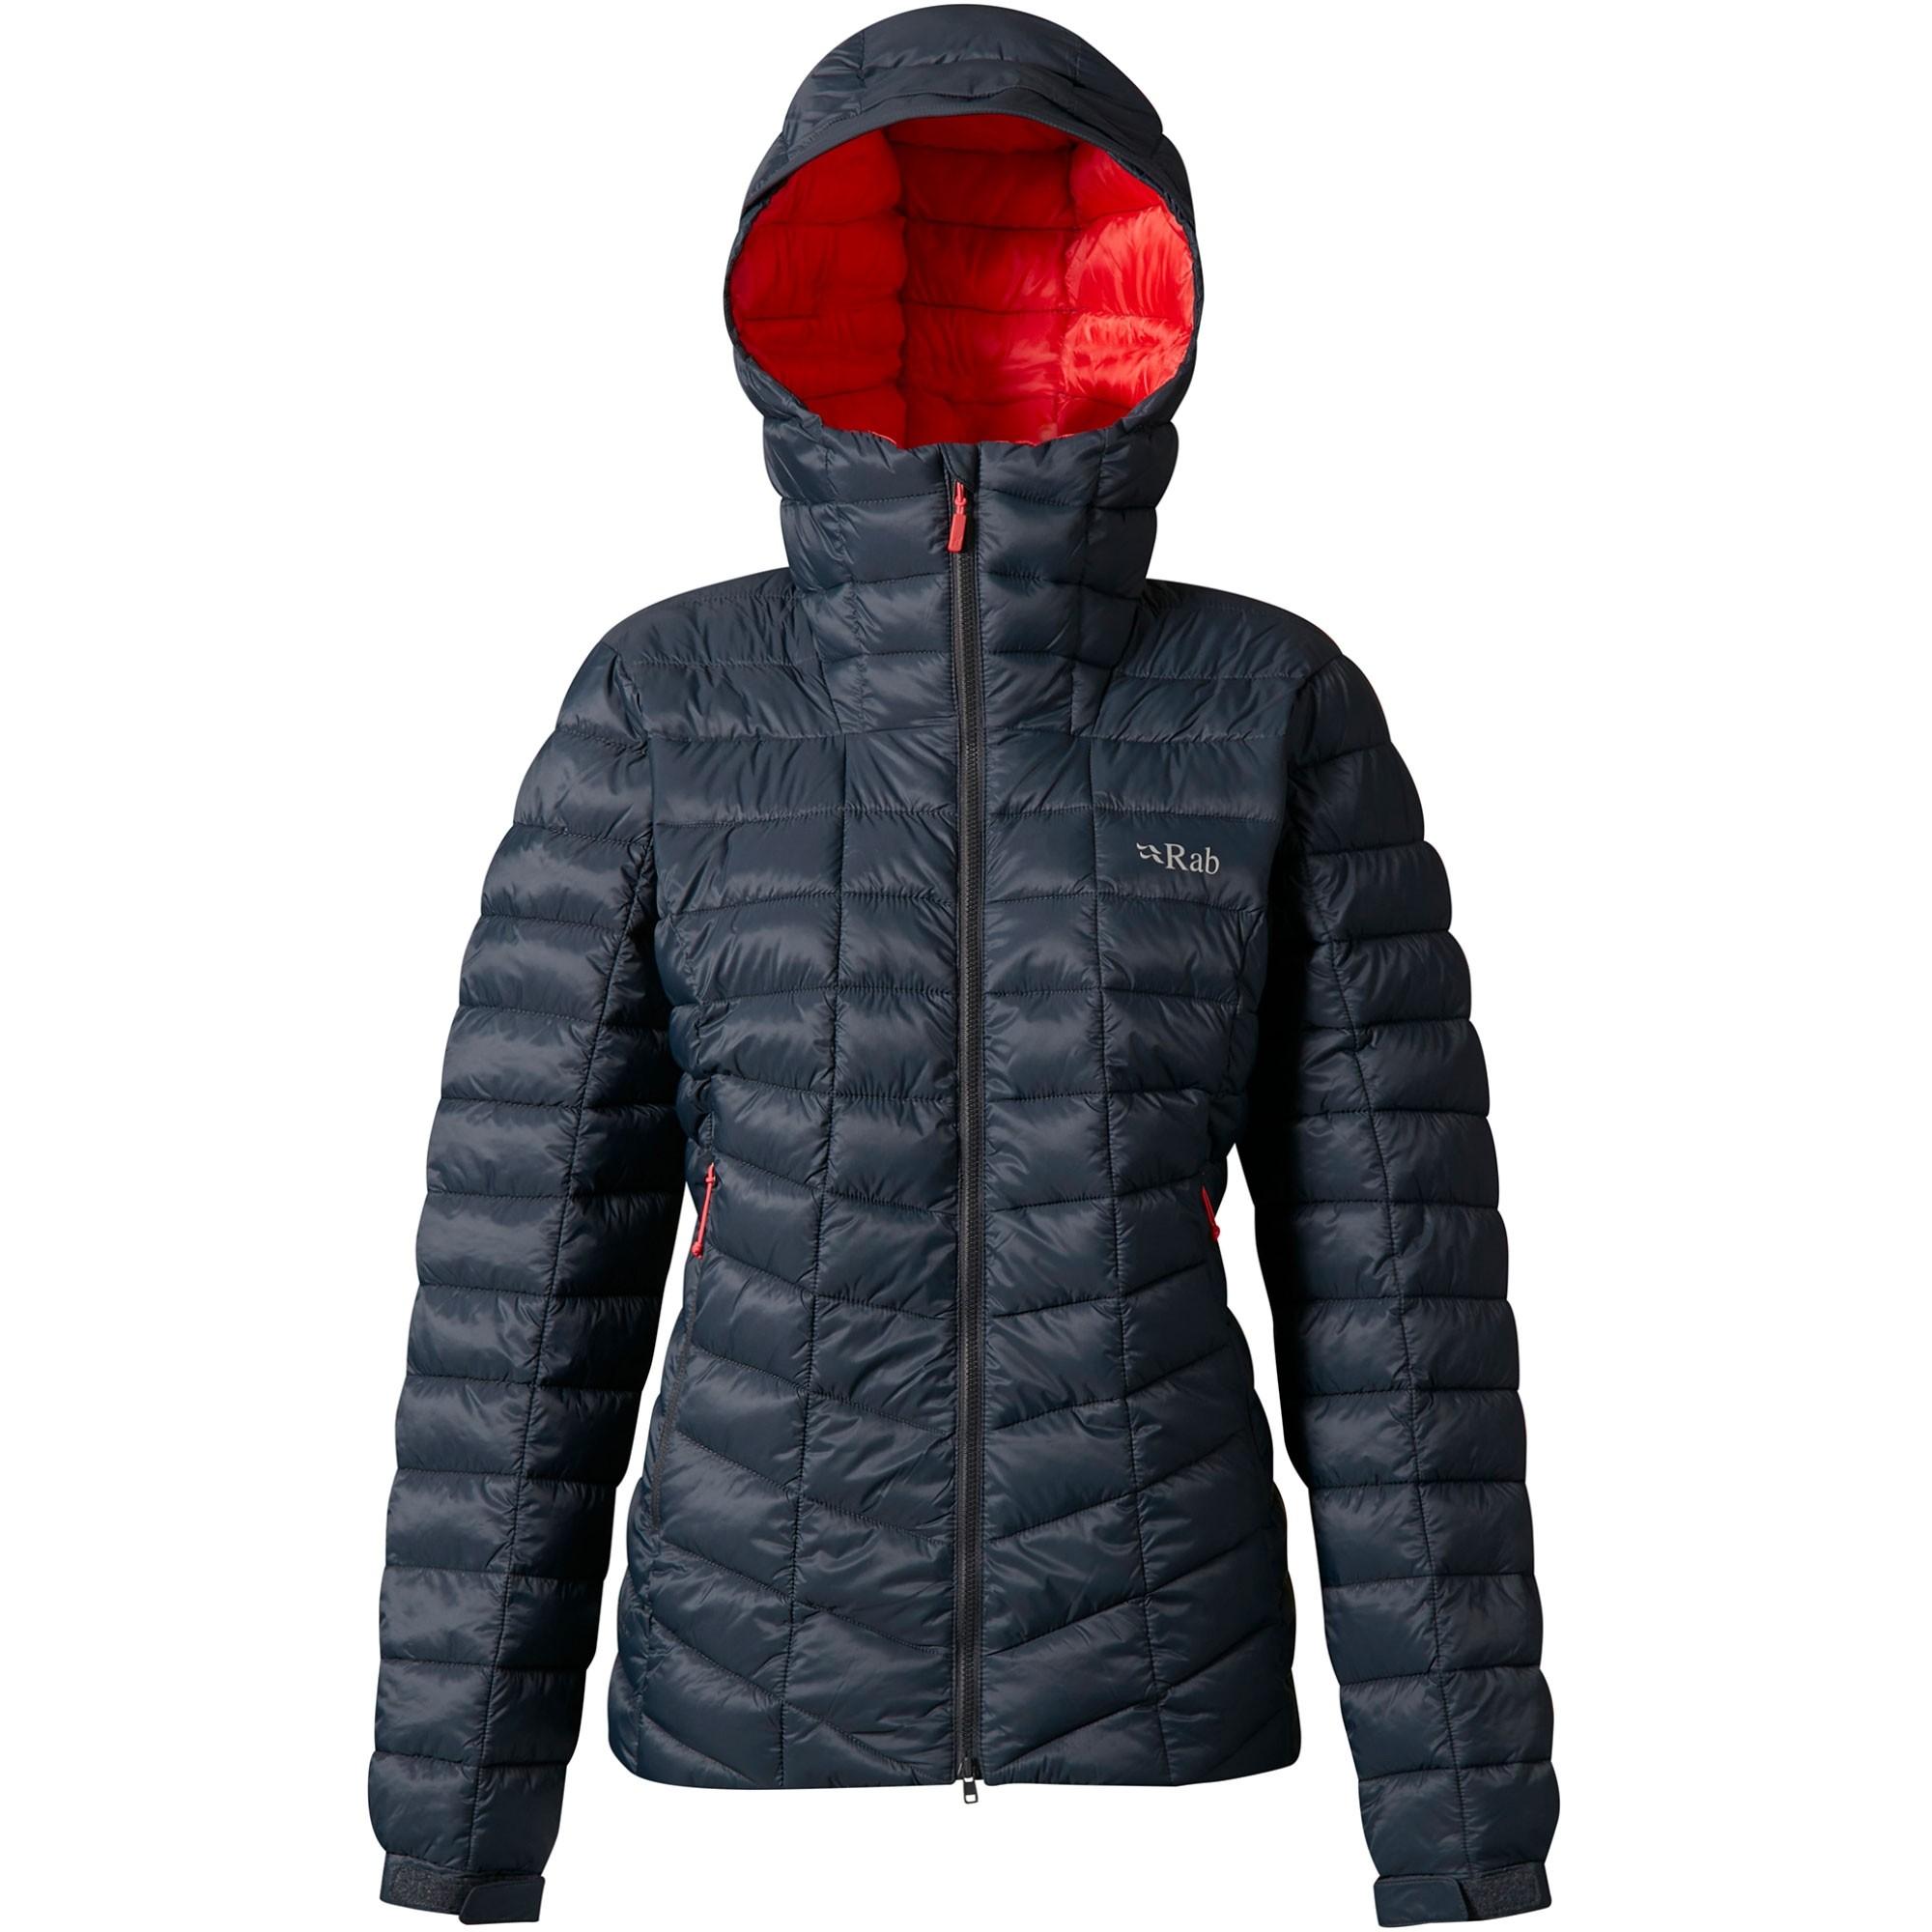 Rab Women's Nebula Pro Jacket - Beluga